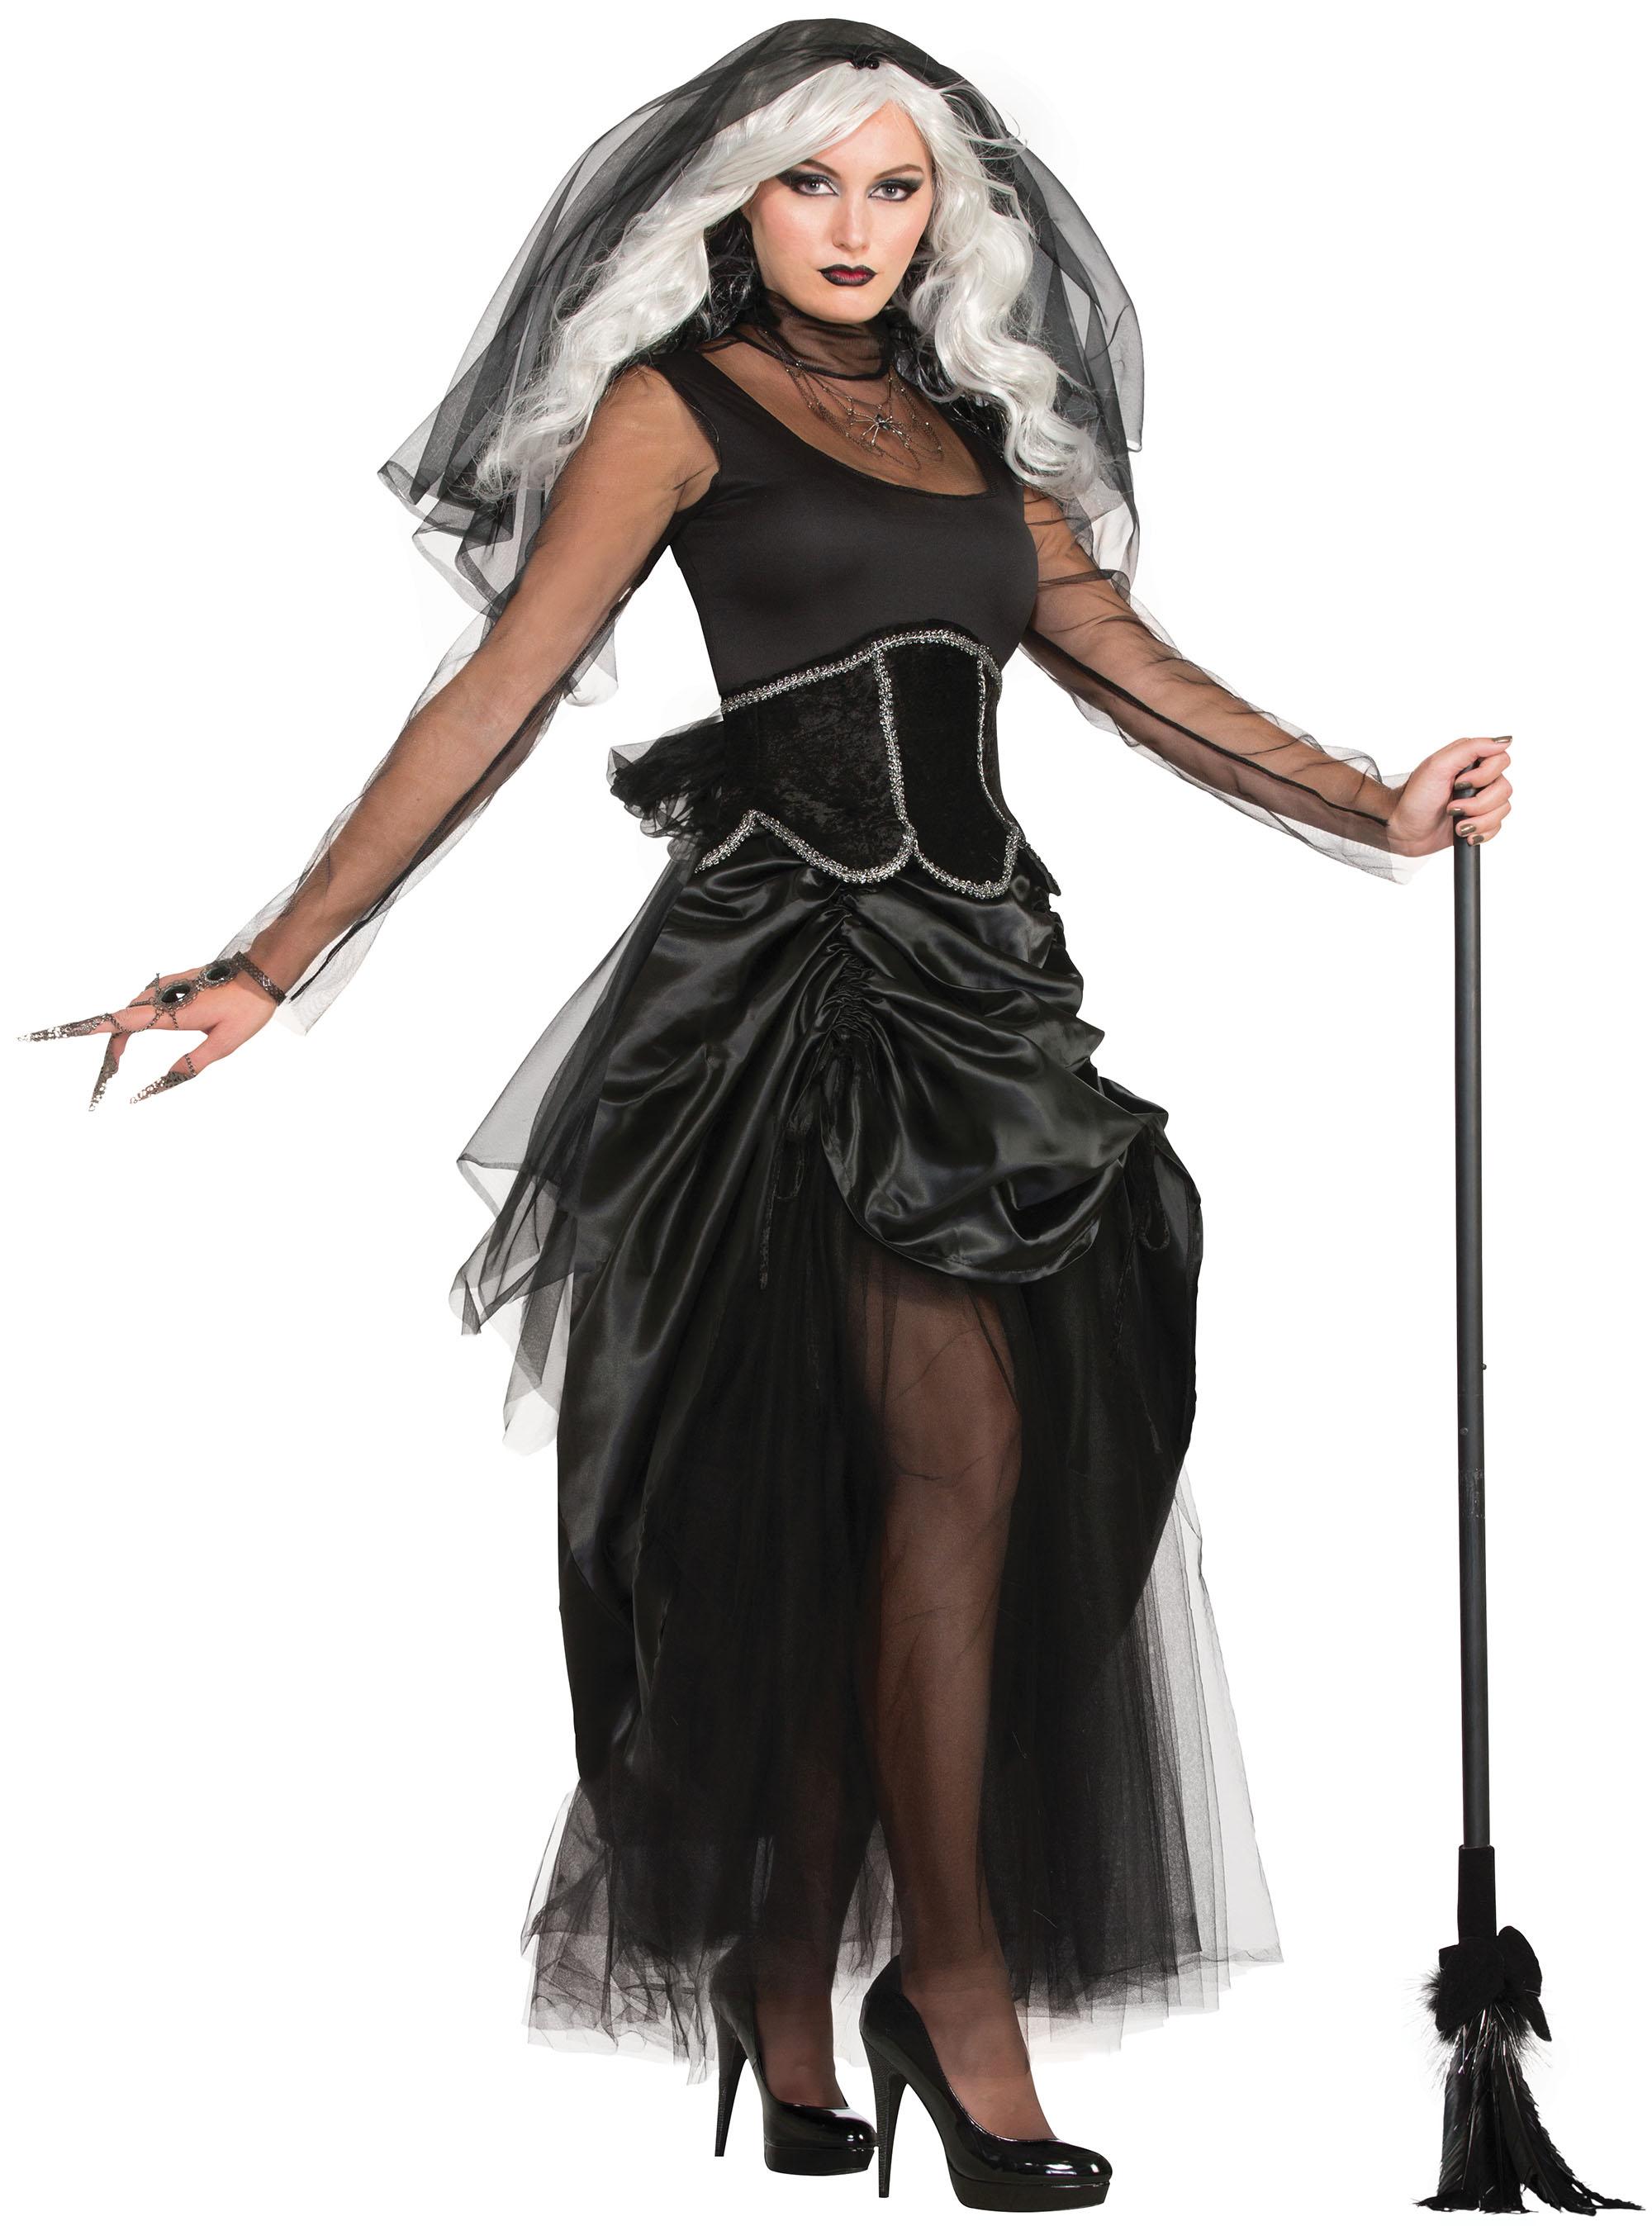 Ladies Shadow Ghost Fancy Dress Costume Halloween Womens Outfit UK 10-14